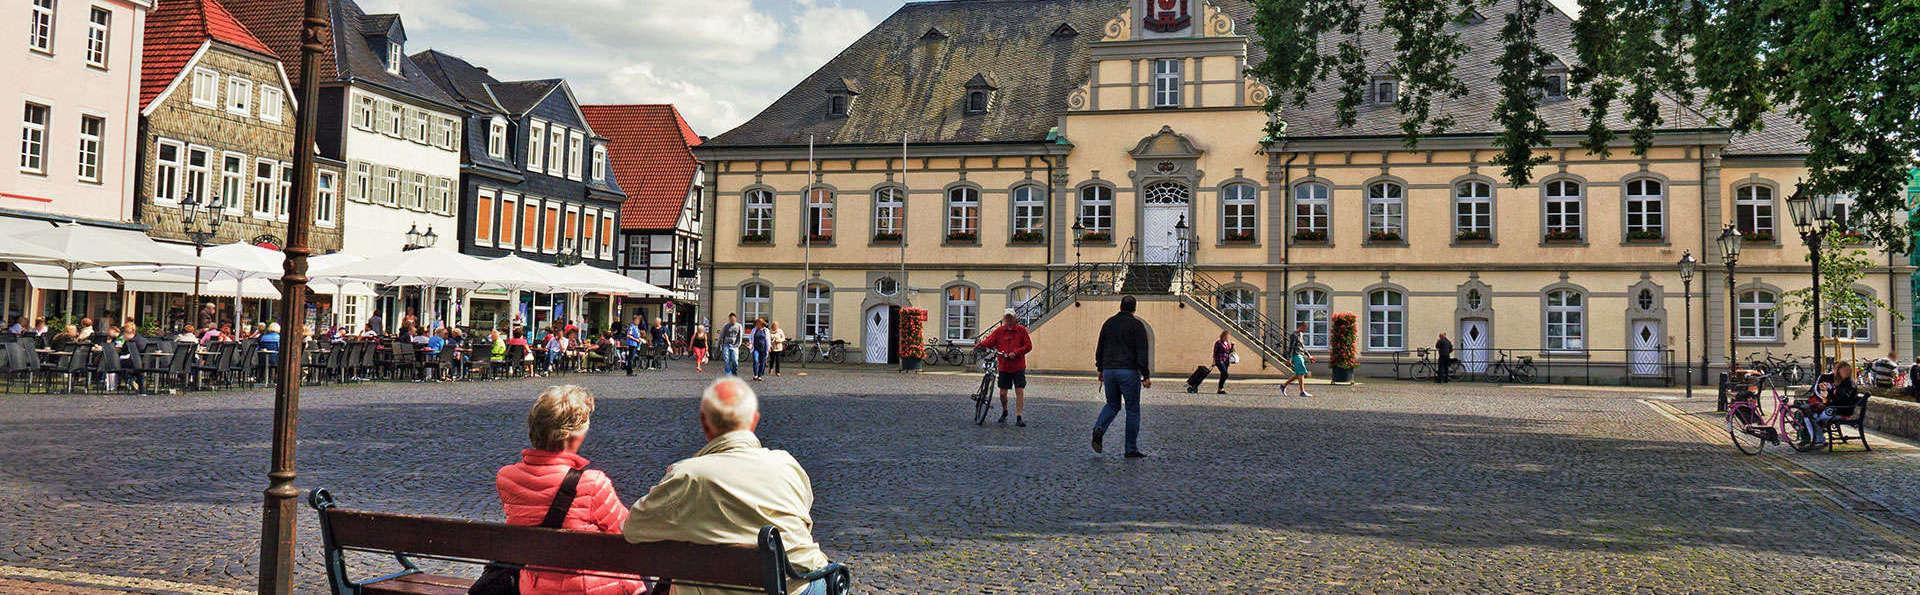 Quality Hotel Lippstadt - EDIT_lippstadt1.jpg